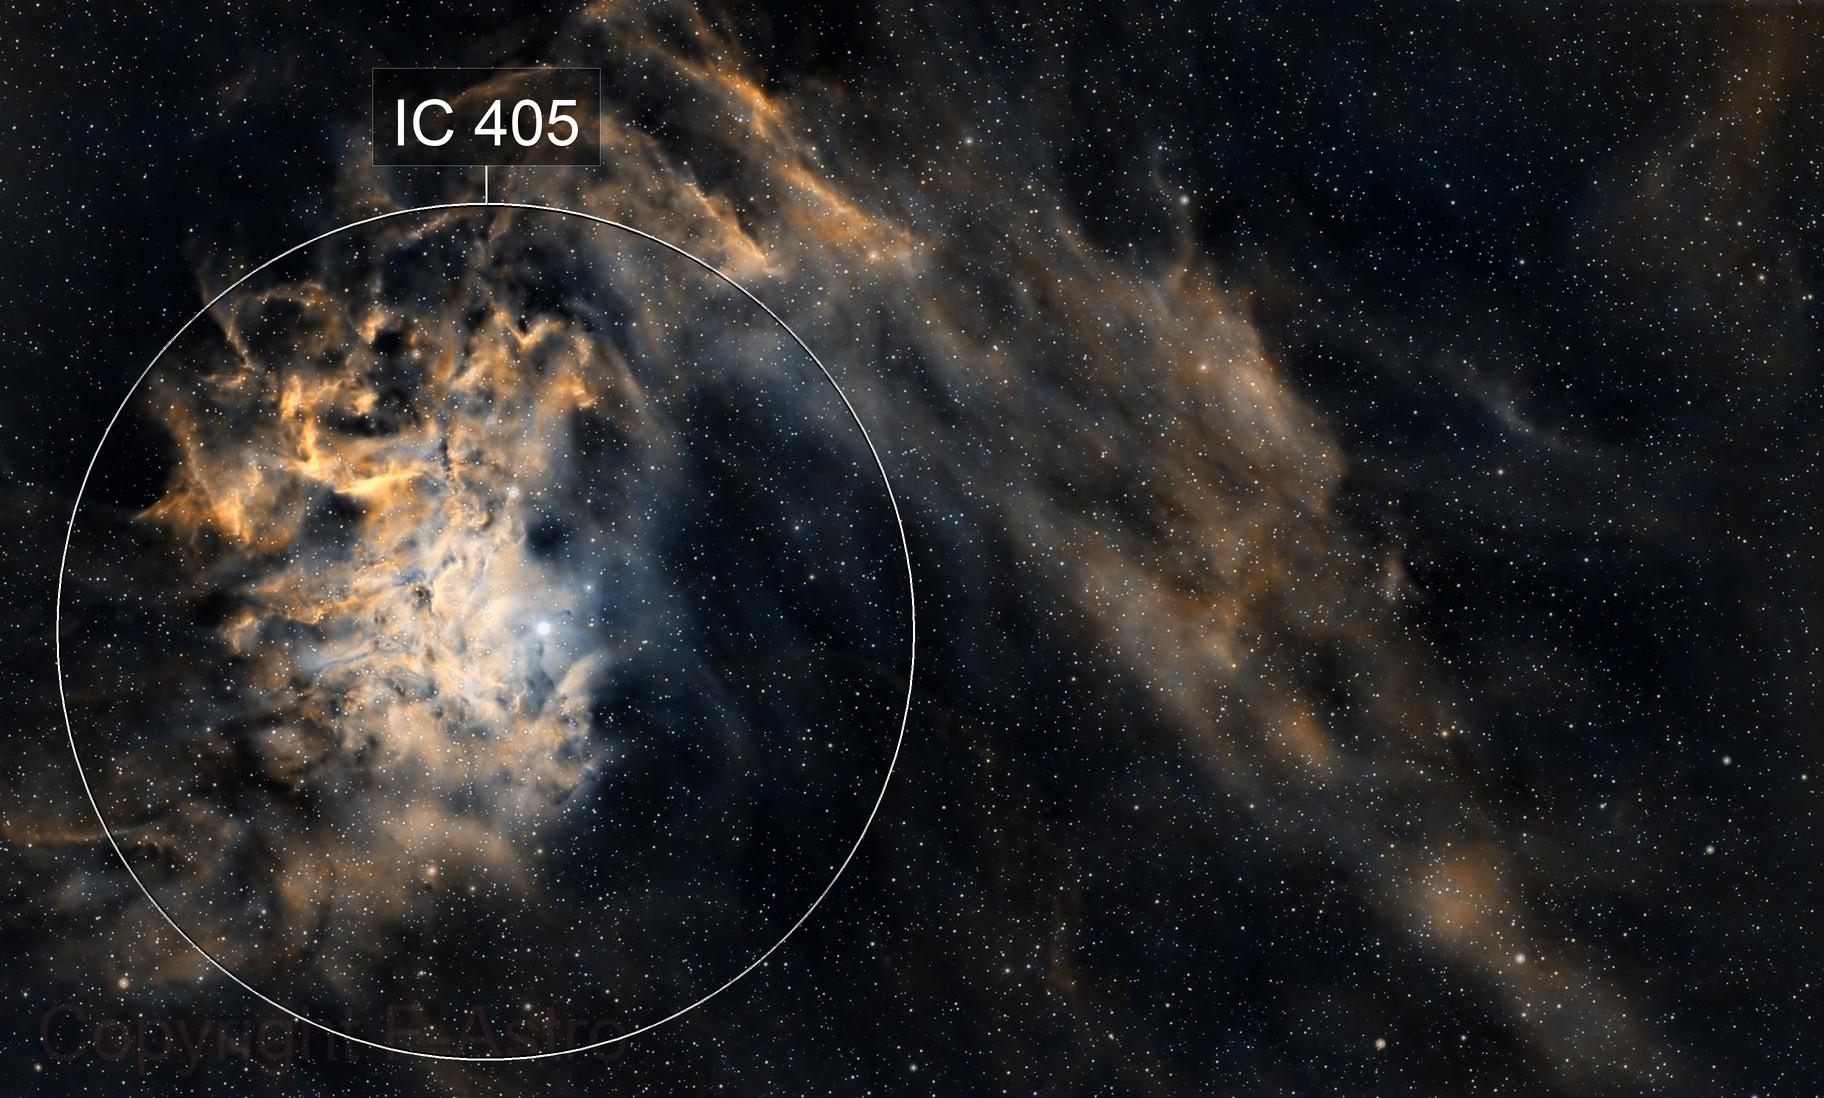 IC505 - The Flaming Star Nebula